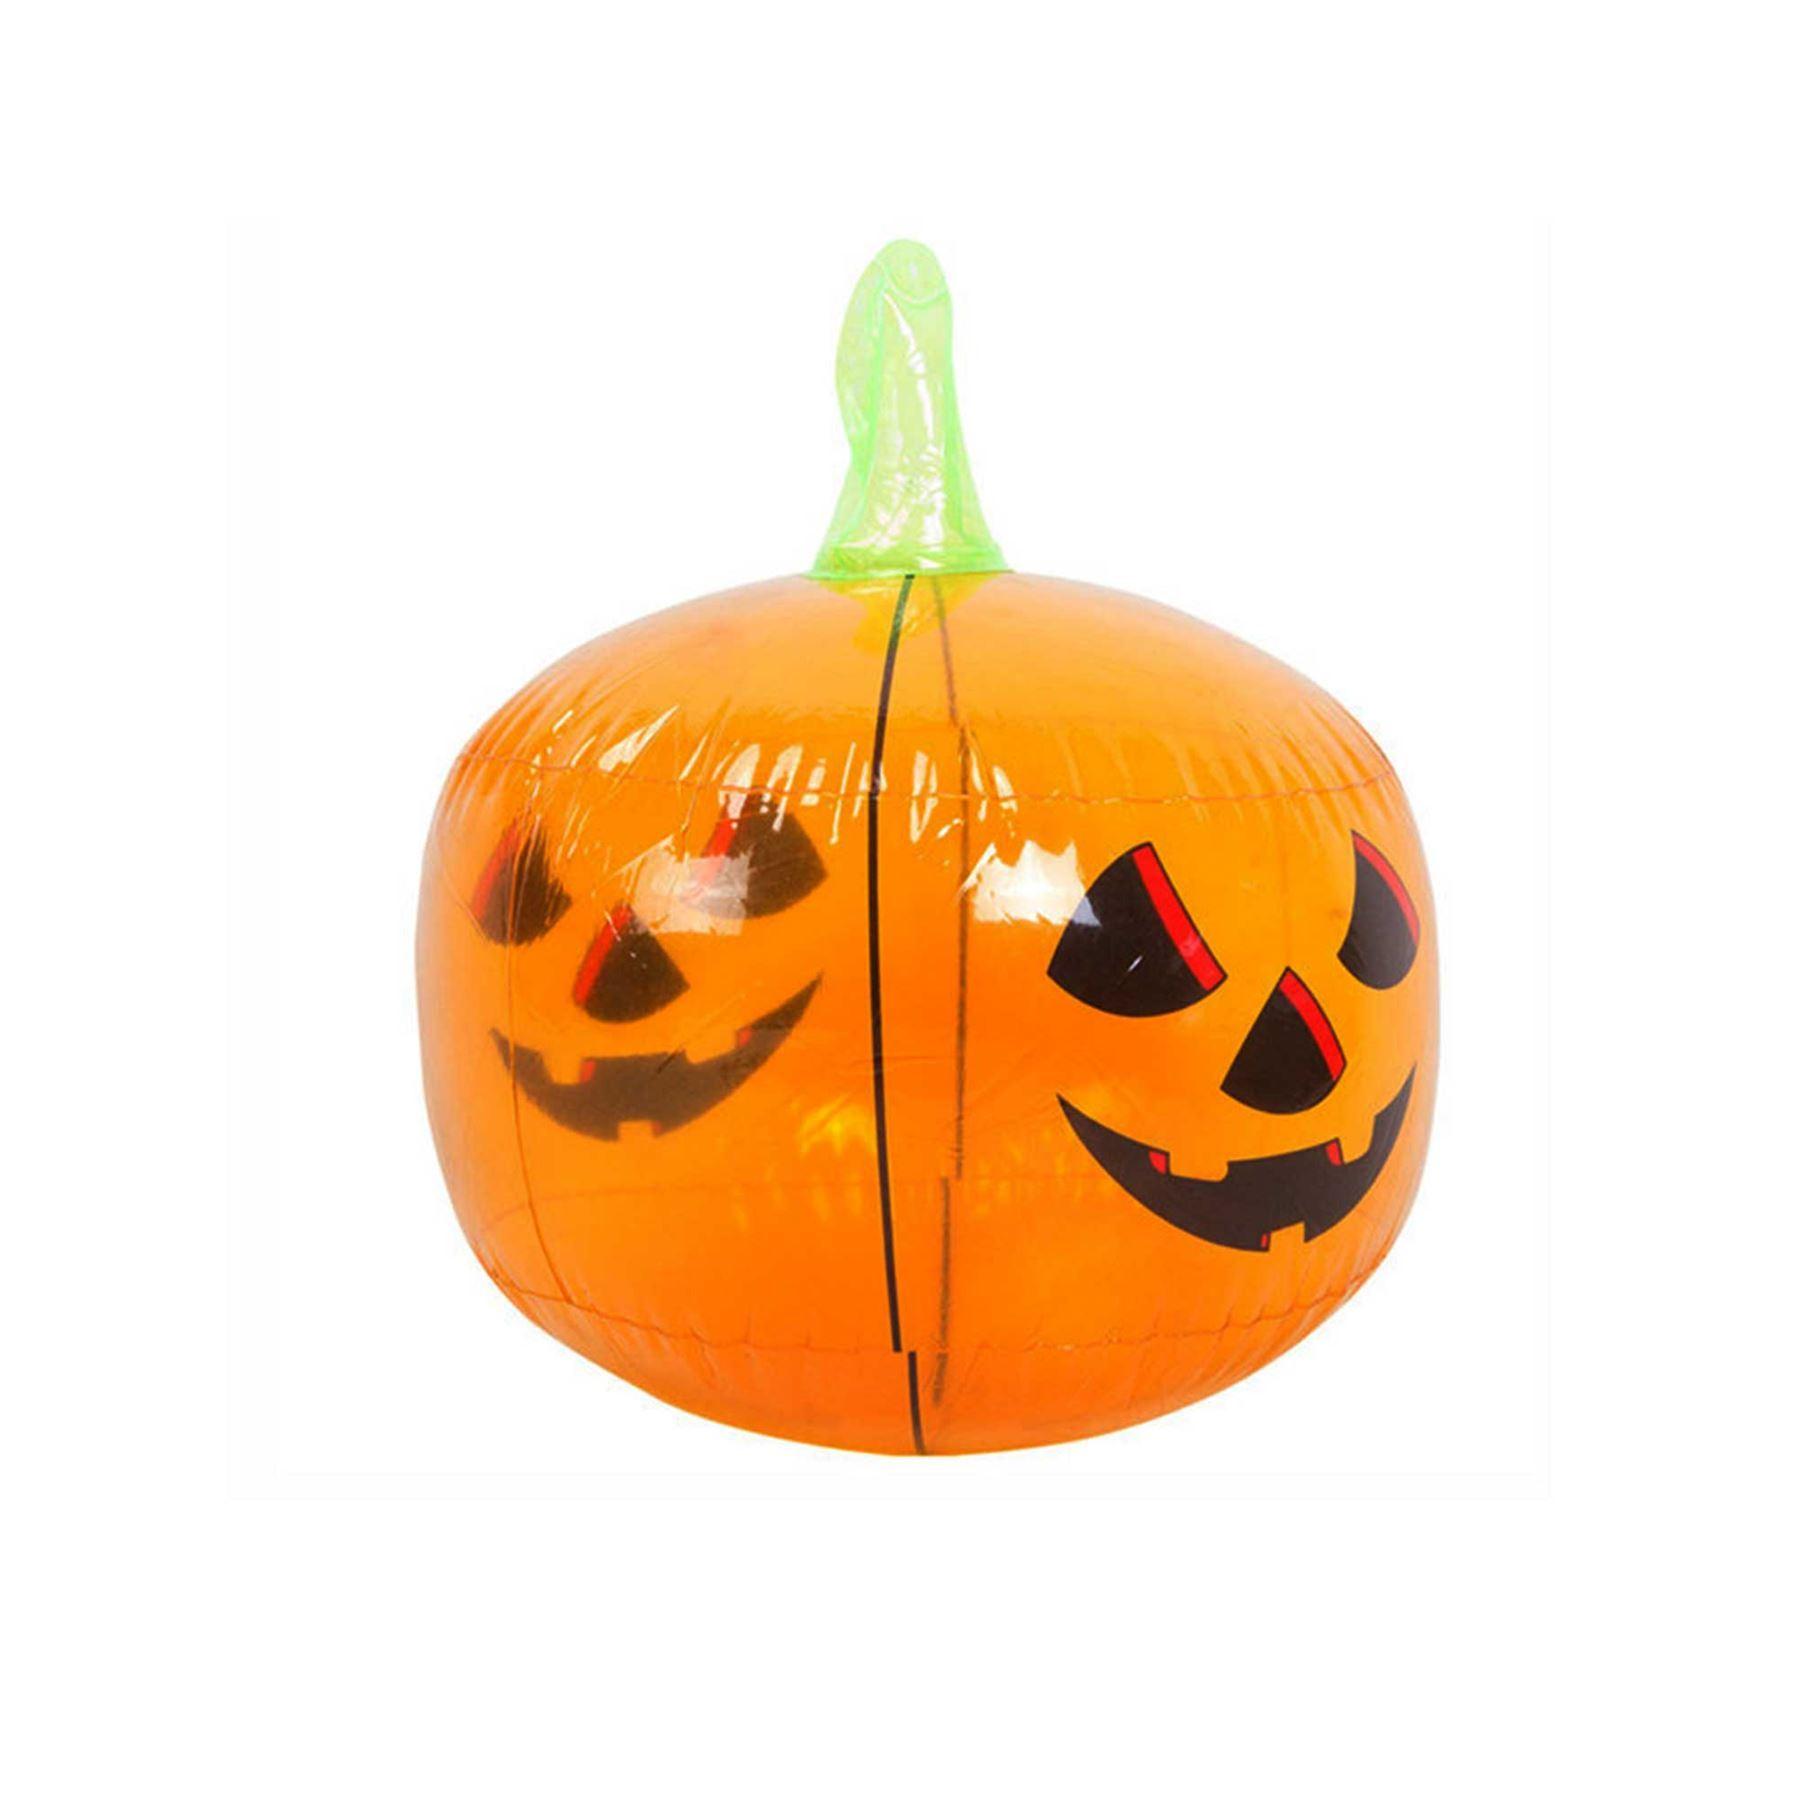 inflatable pumpkin skeleton spider bat halloween decorations hanging